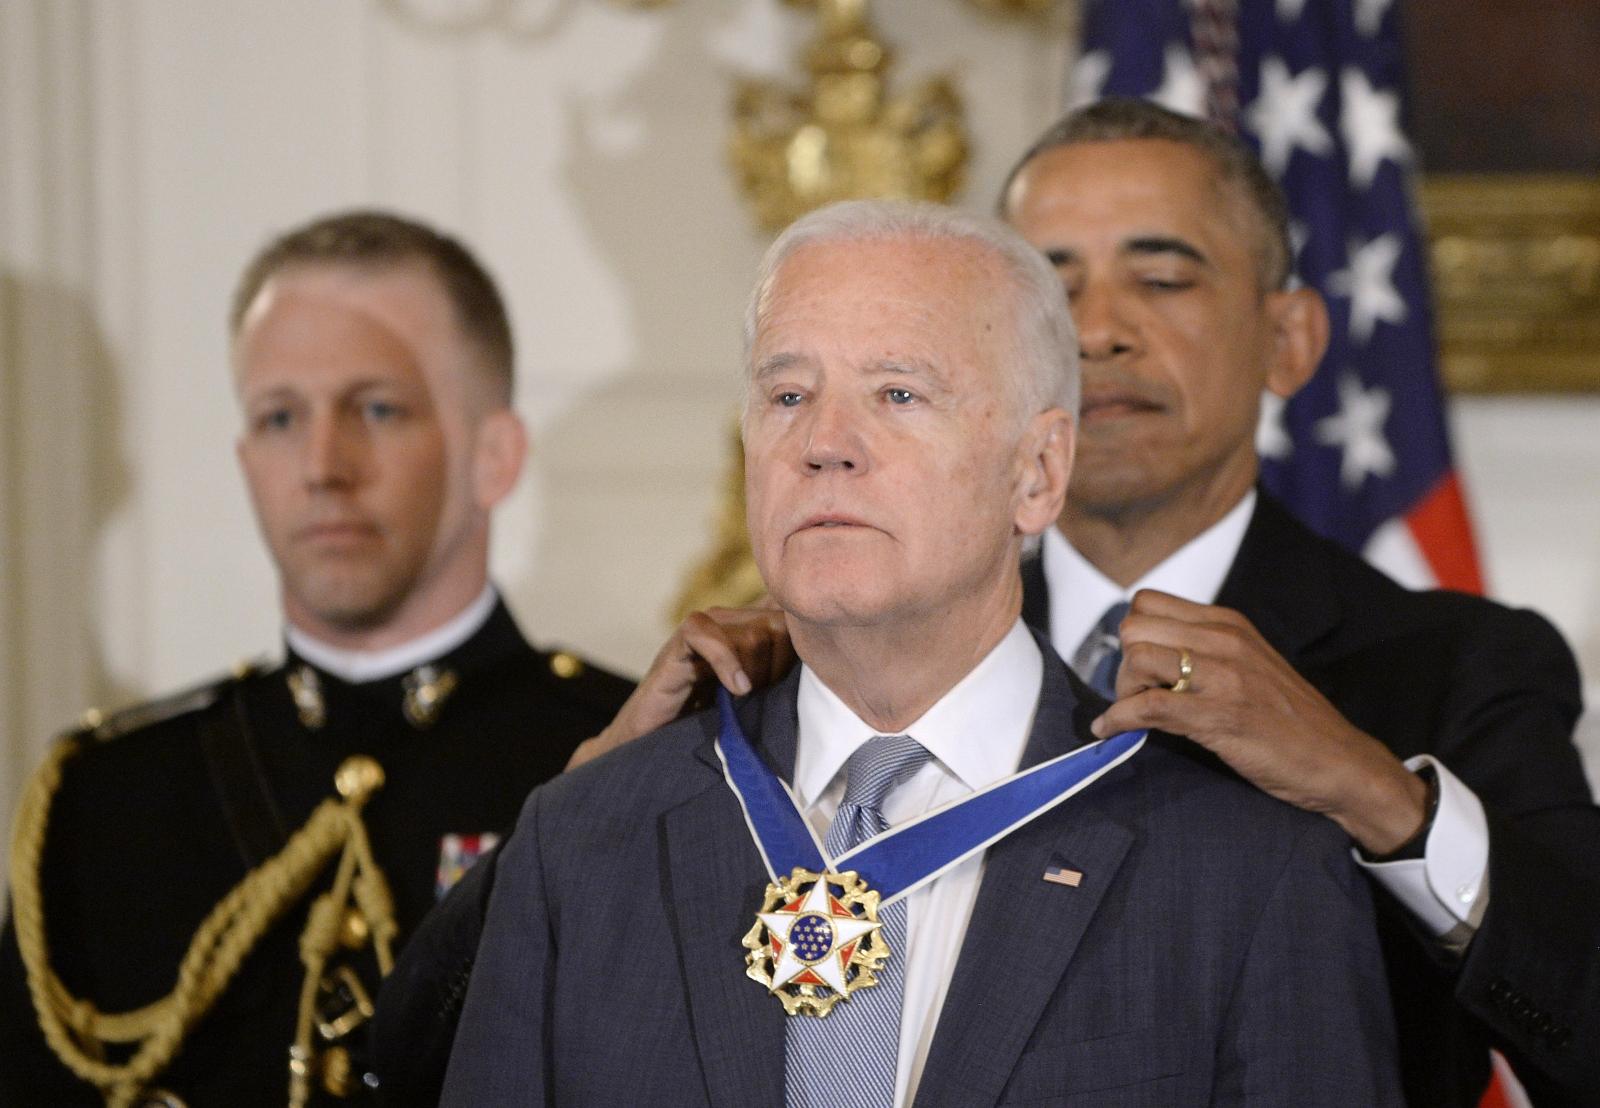 Obama awards Biden the medal of freedom